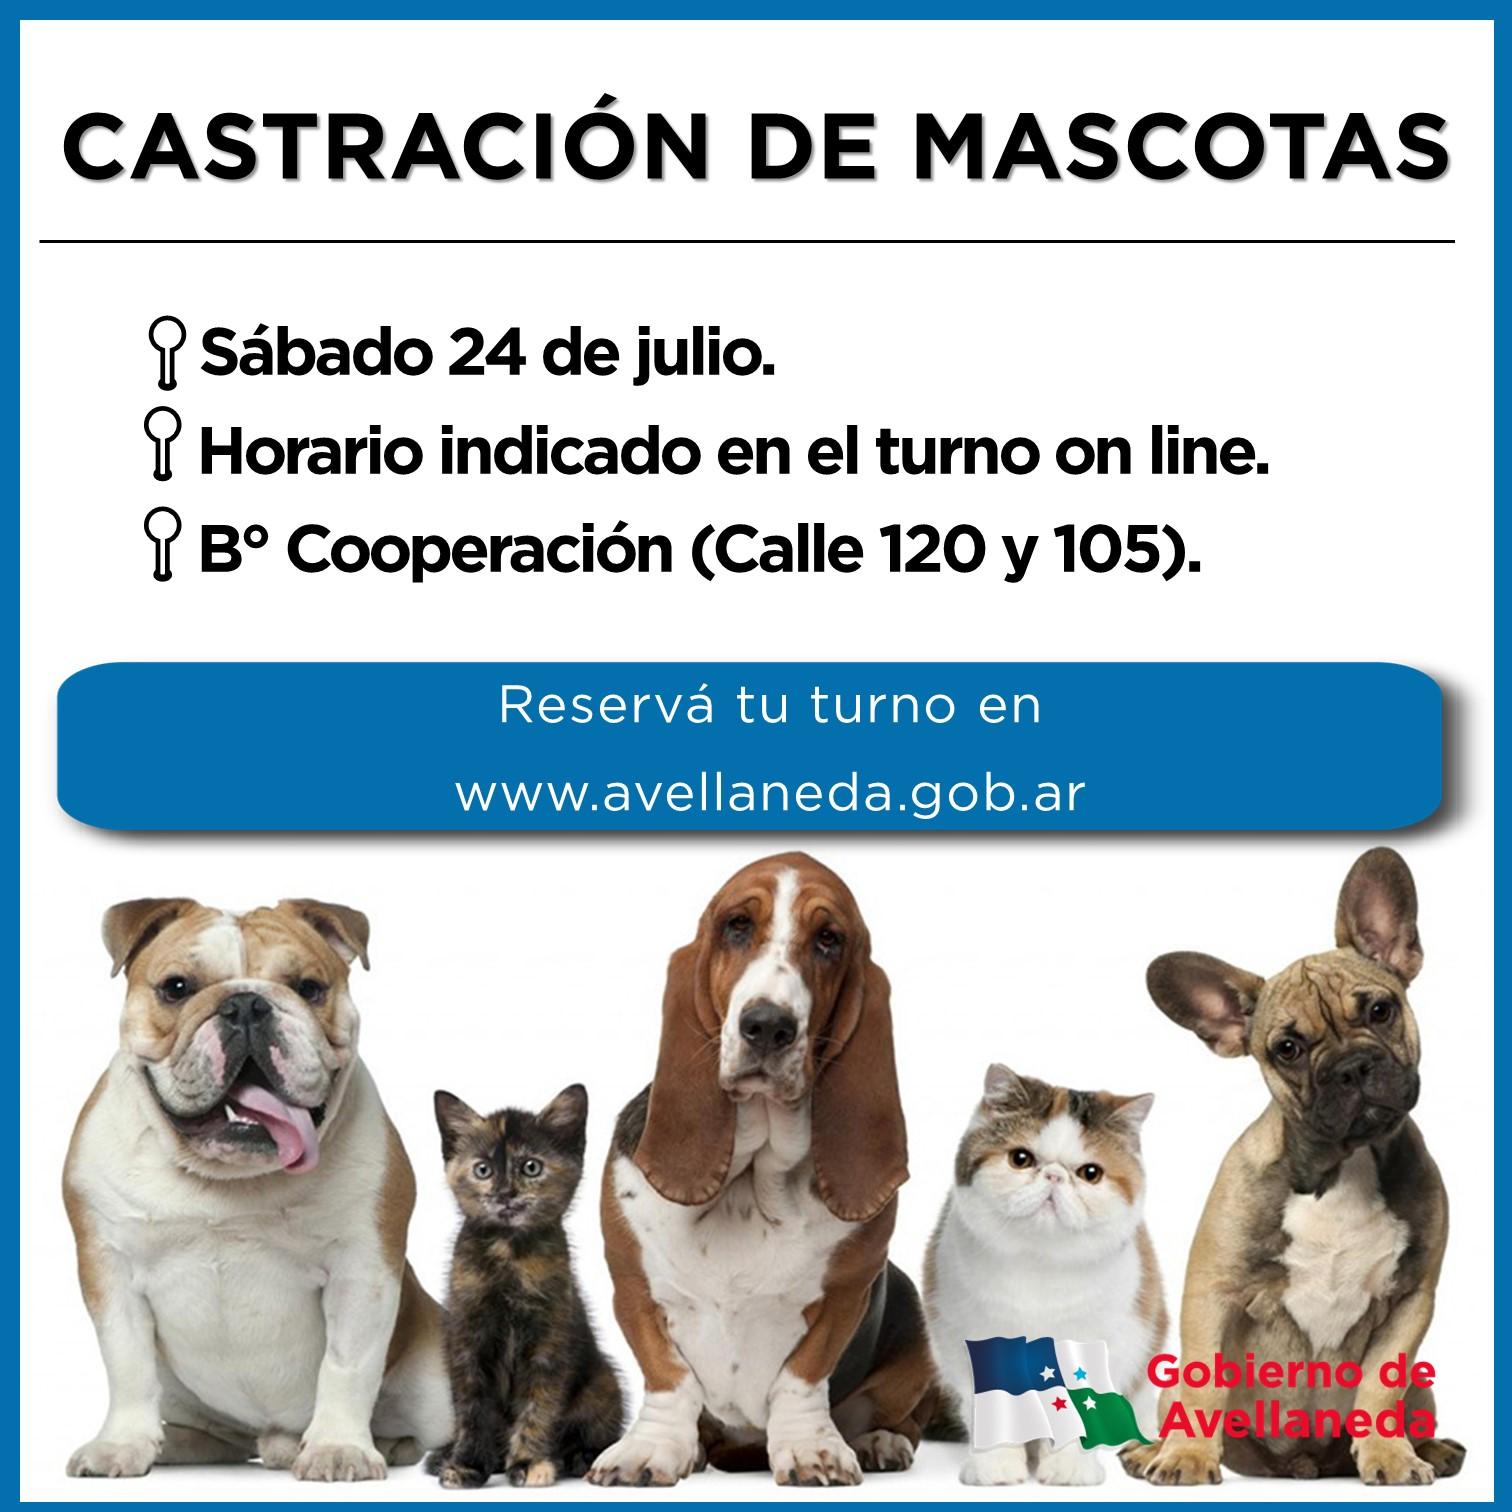 Castración de mascotas en B° Cooperación de Avellaneda